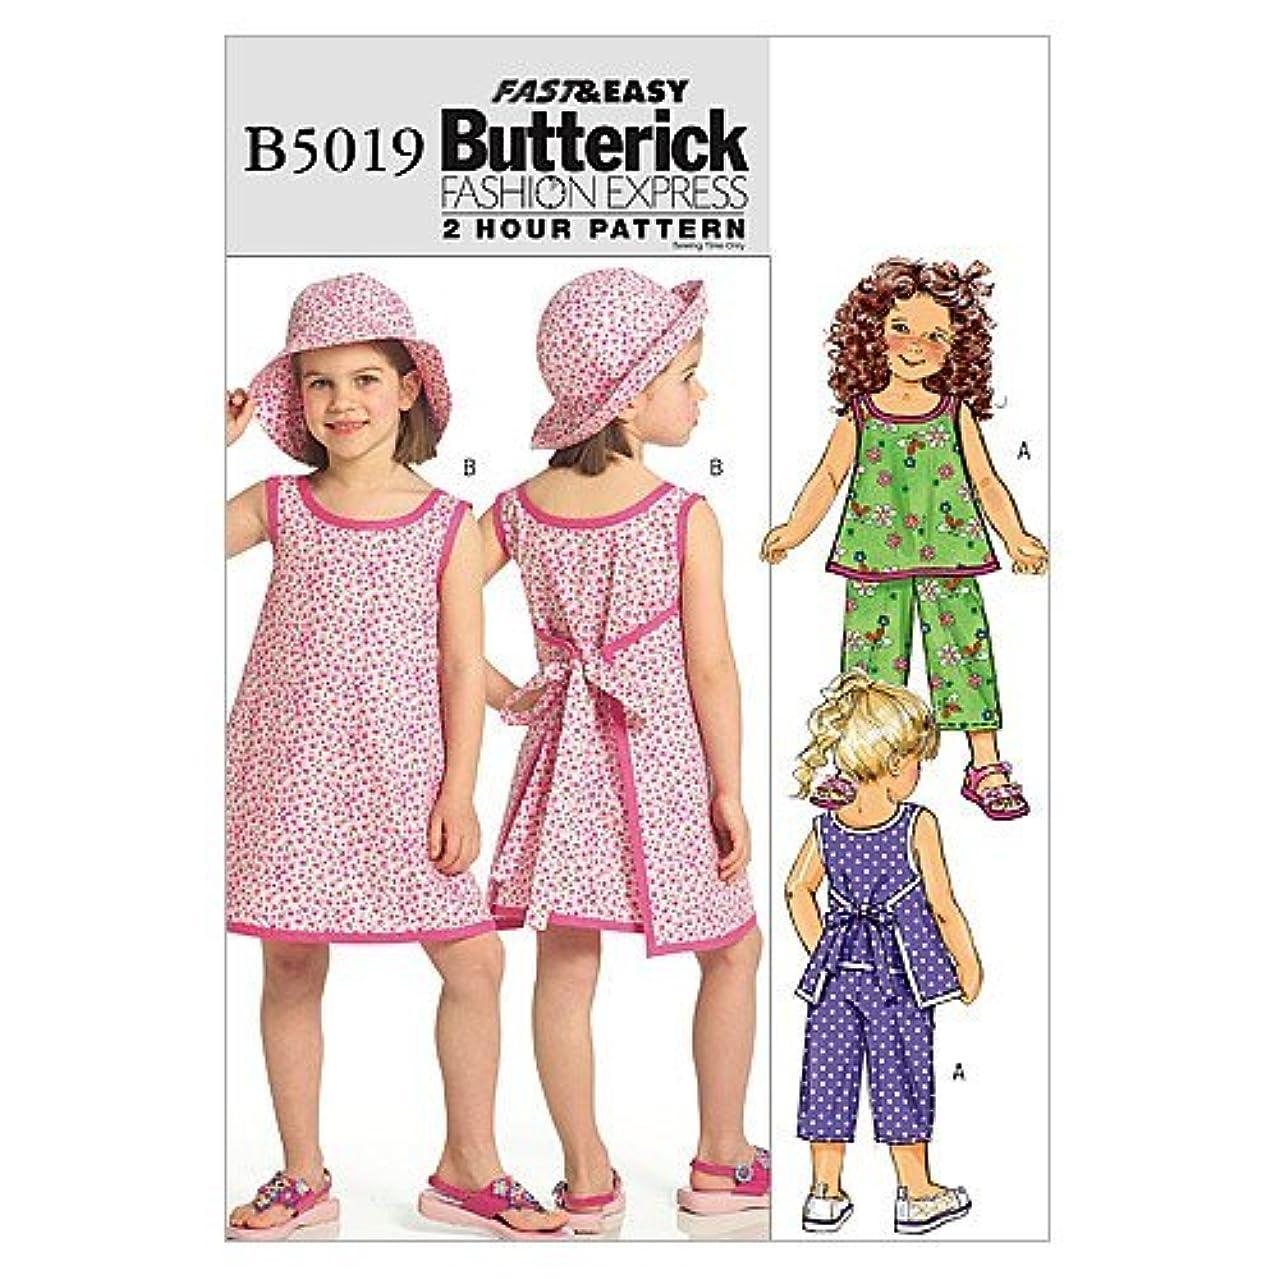 BUTTERICK PATTERNS B5019 Children's/Girls Top, Dress, Pants and Hat, Size CL (6-7-8)